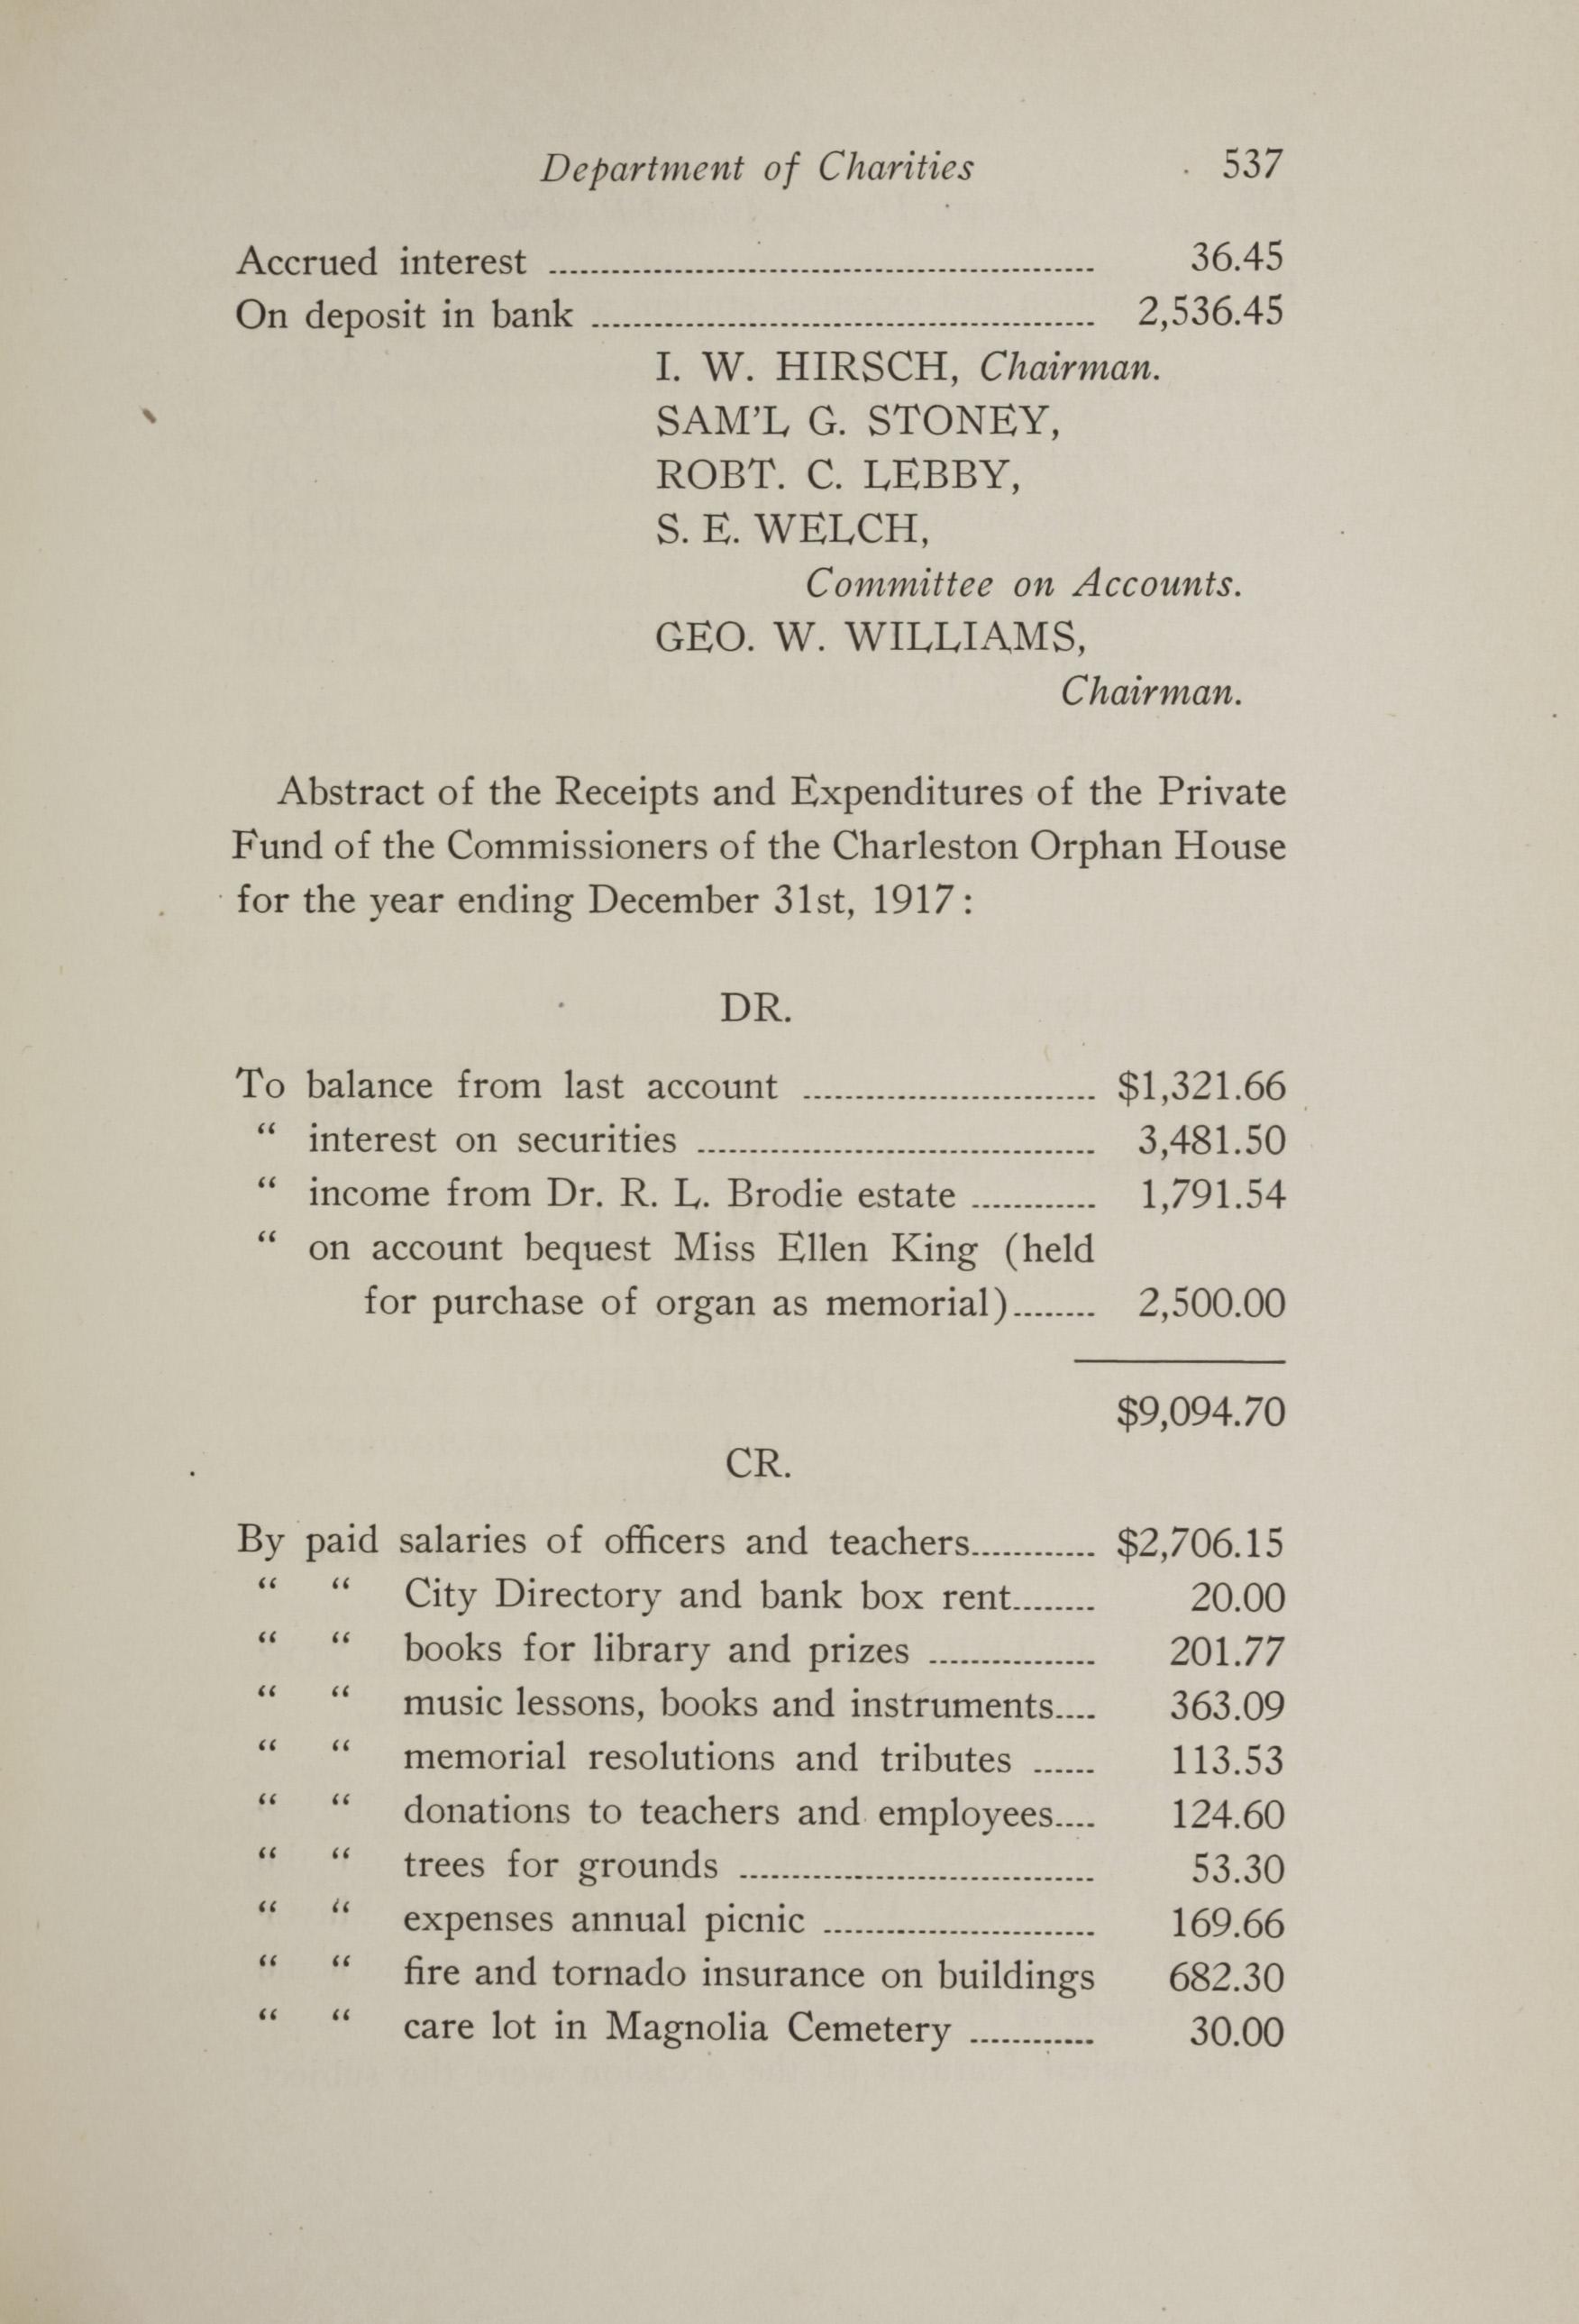 Charleston Yearbook, 1917, page 537